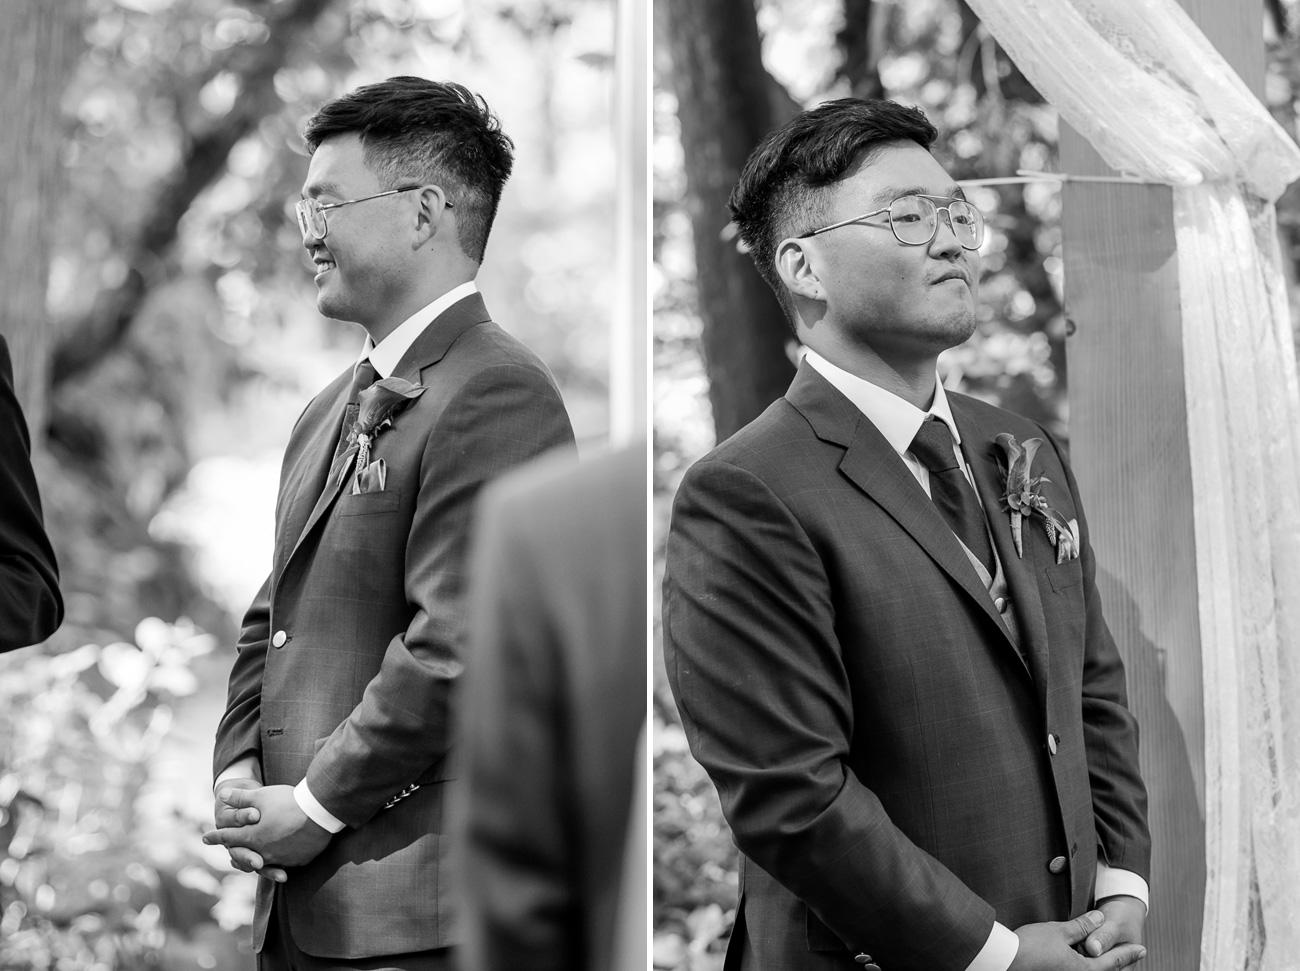 loloma-lodge-oregon-wedding-40 Loloma Lodge Oregon Wedding | Anna & Justin | Traditional Korean Tea Ceremony